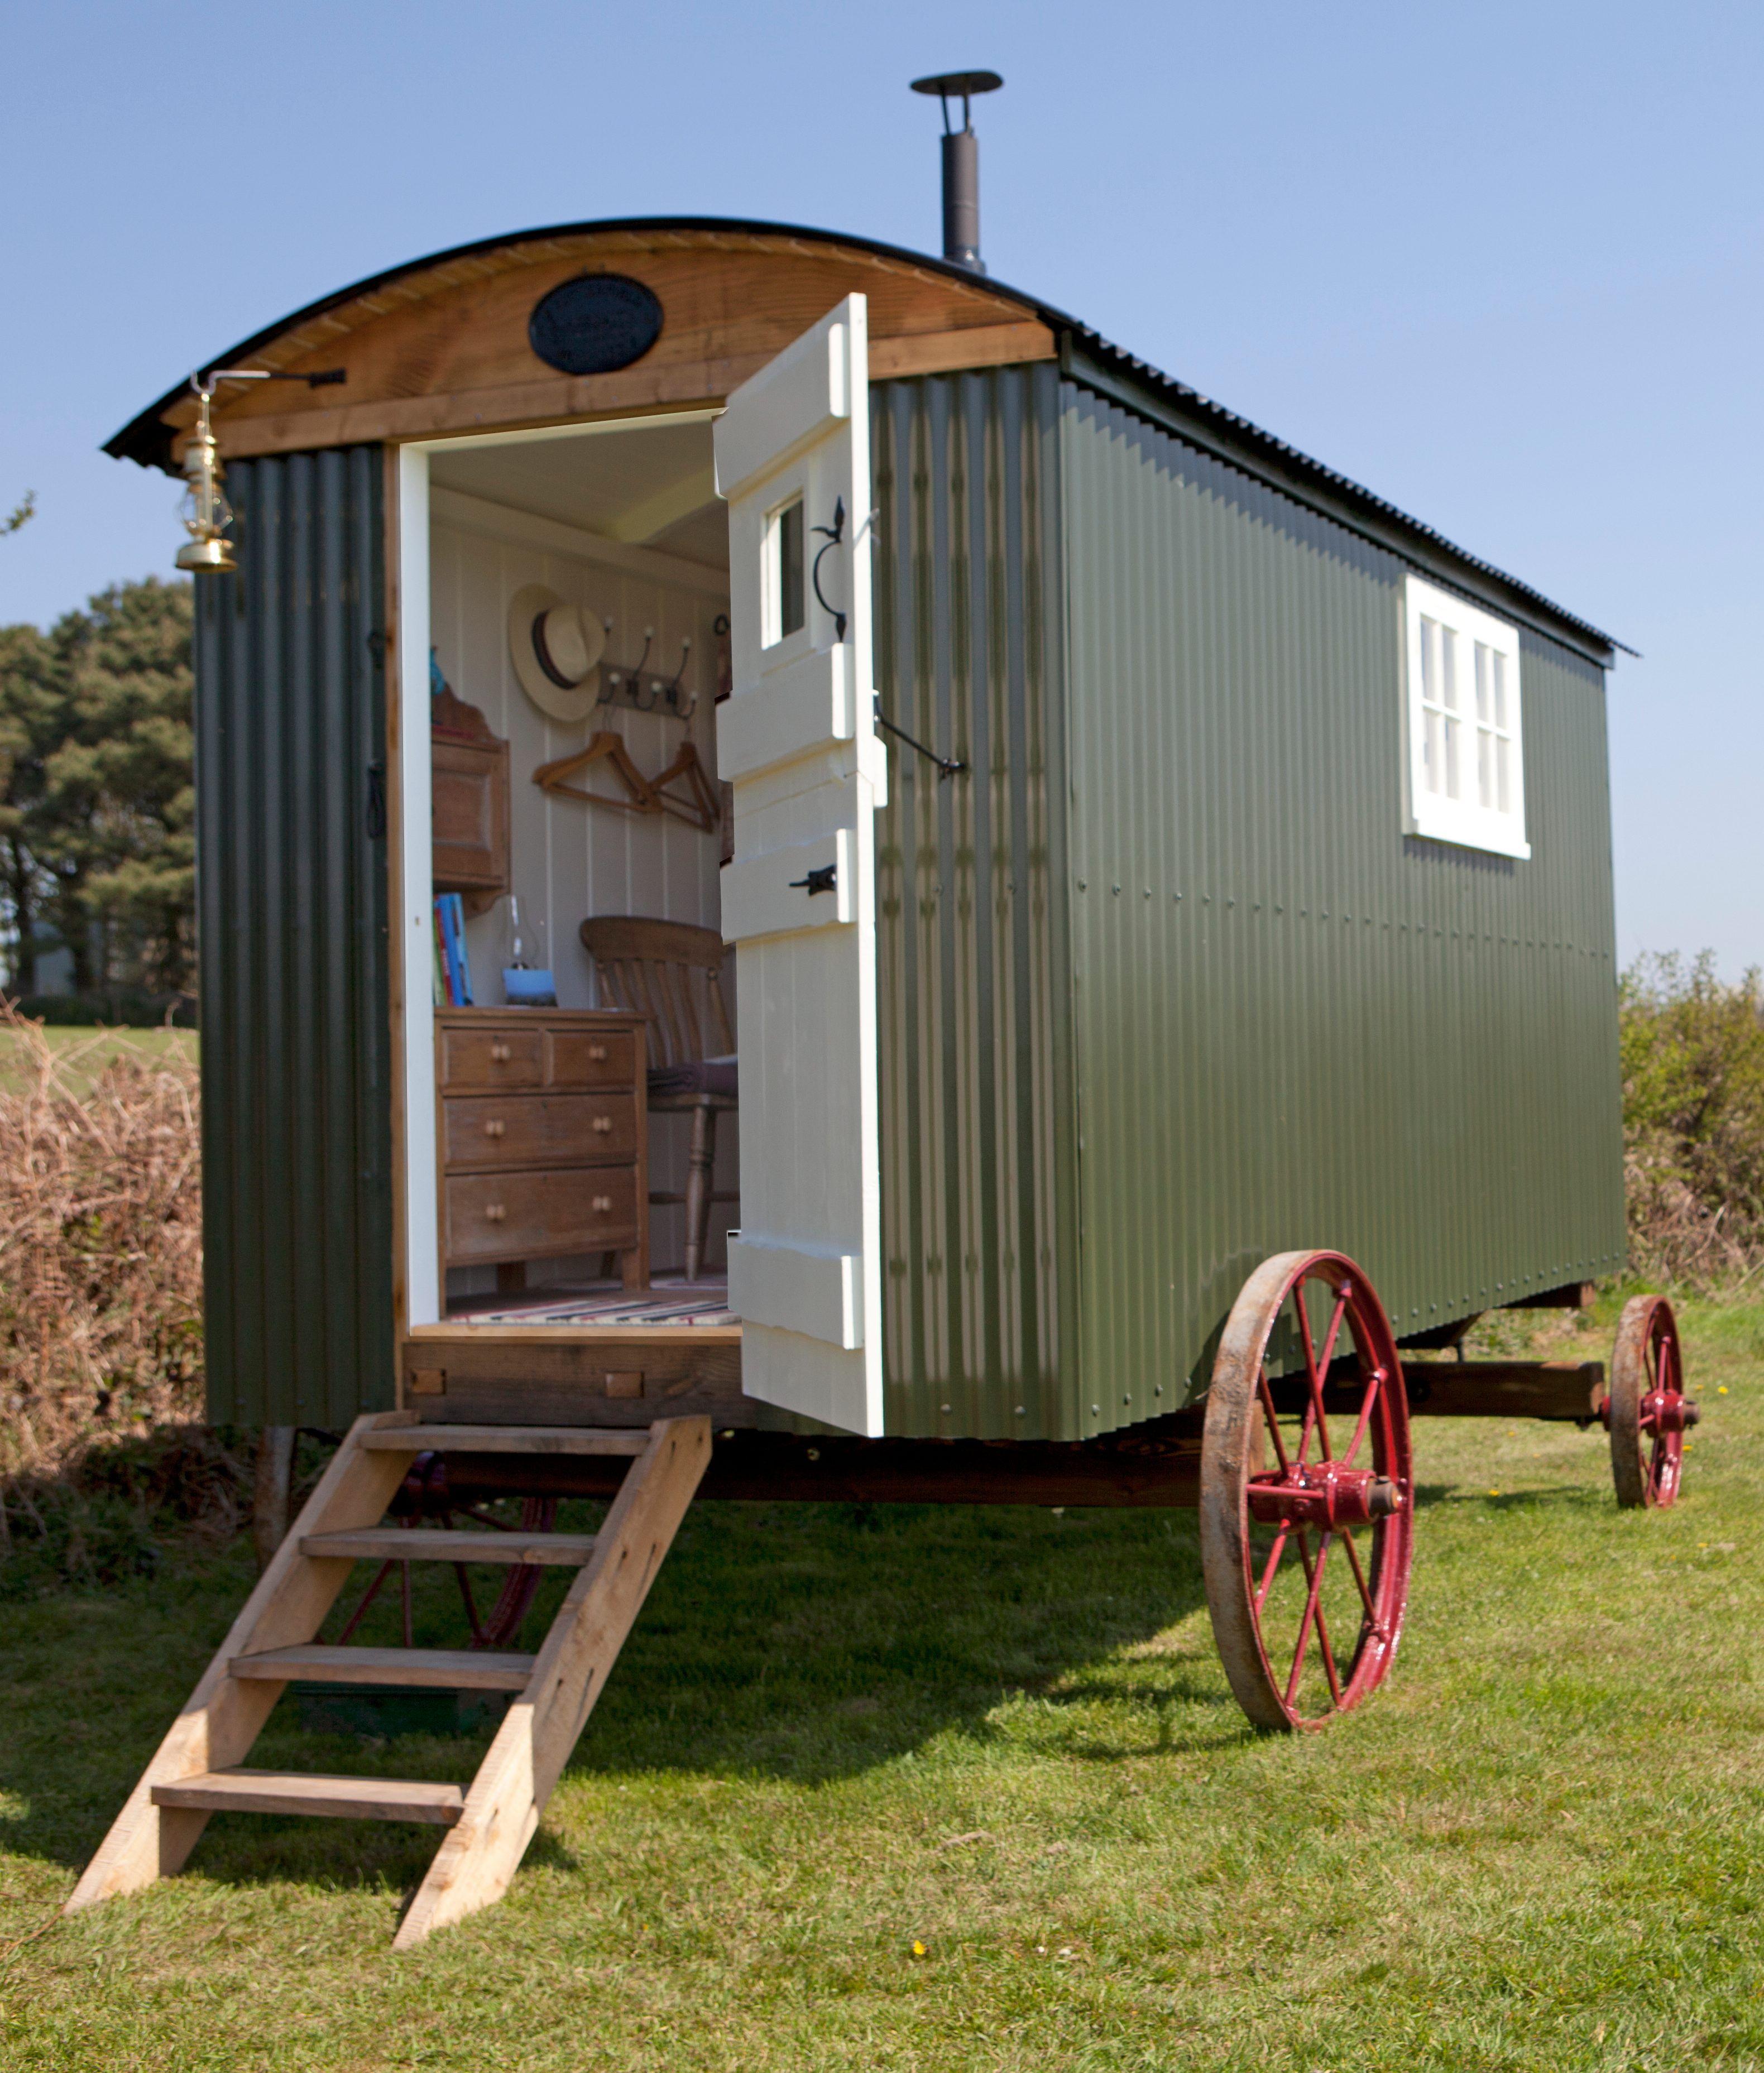 Best Cabins On Airbnb Luxury Shepherds Hut Camping Pinterest Shepherds Hut